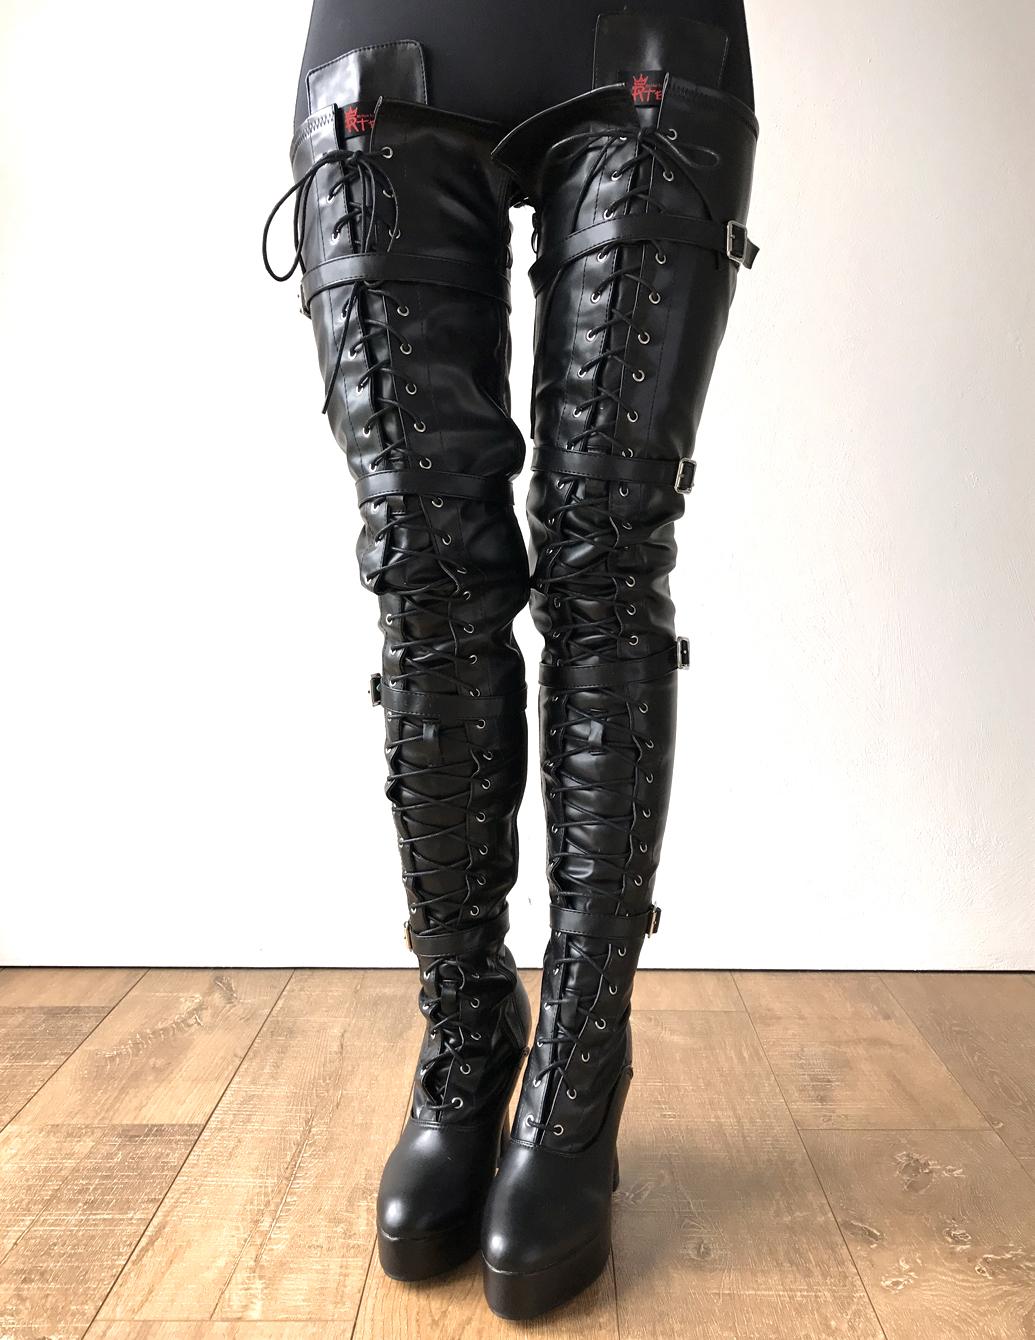 rebelsmarket_chuk_12cm_spool_heel_platform_crotch_goth_punk_pinup_cosplay_fetish_boots_boots_17.jpg